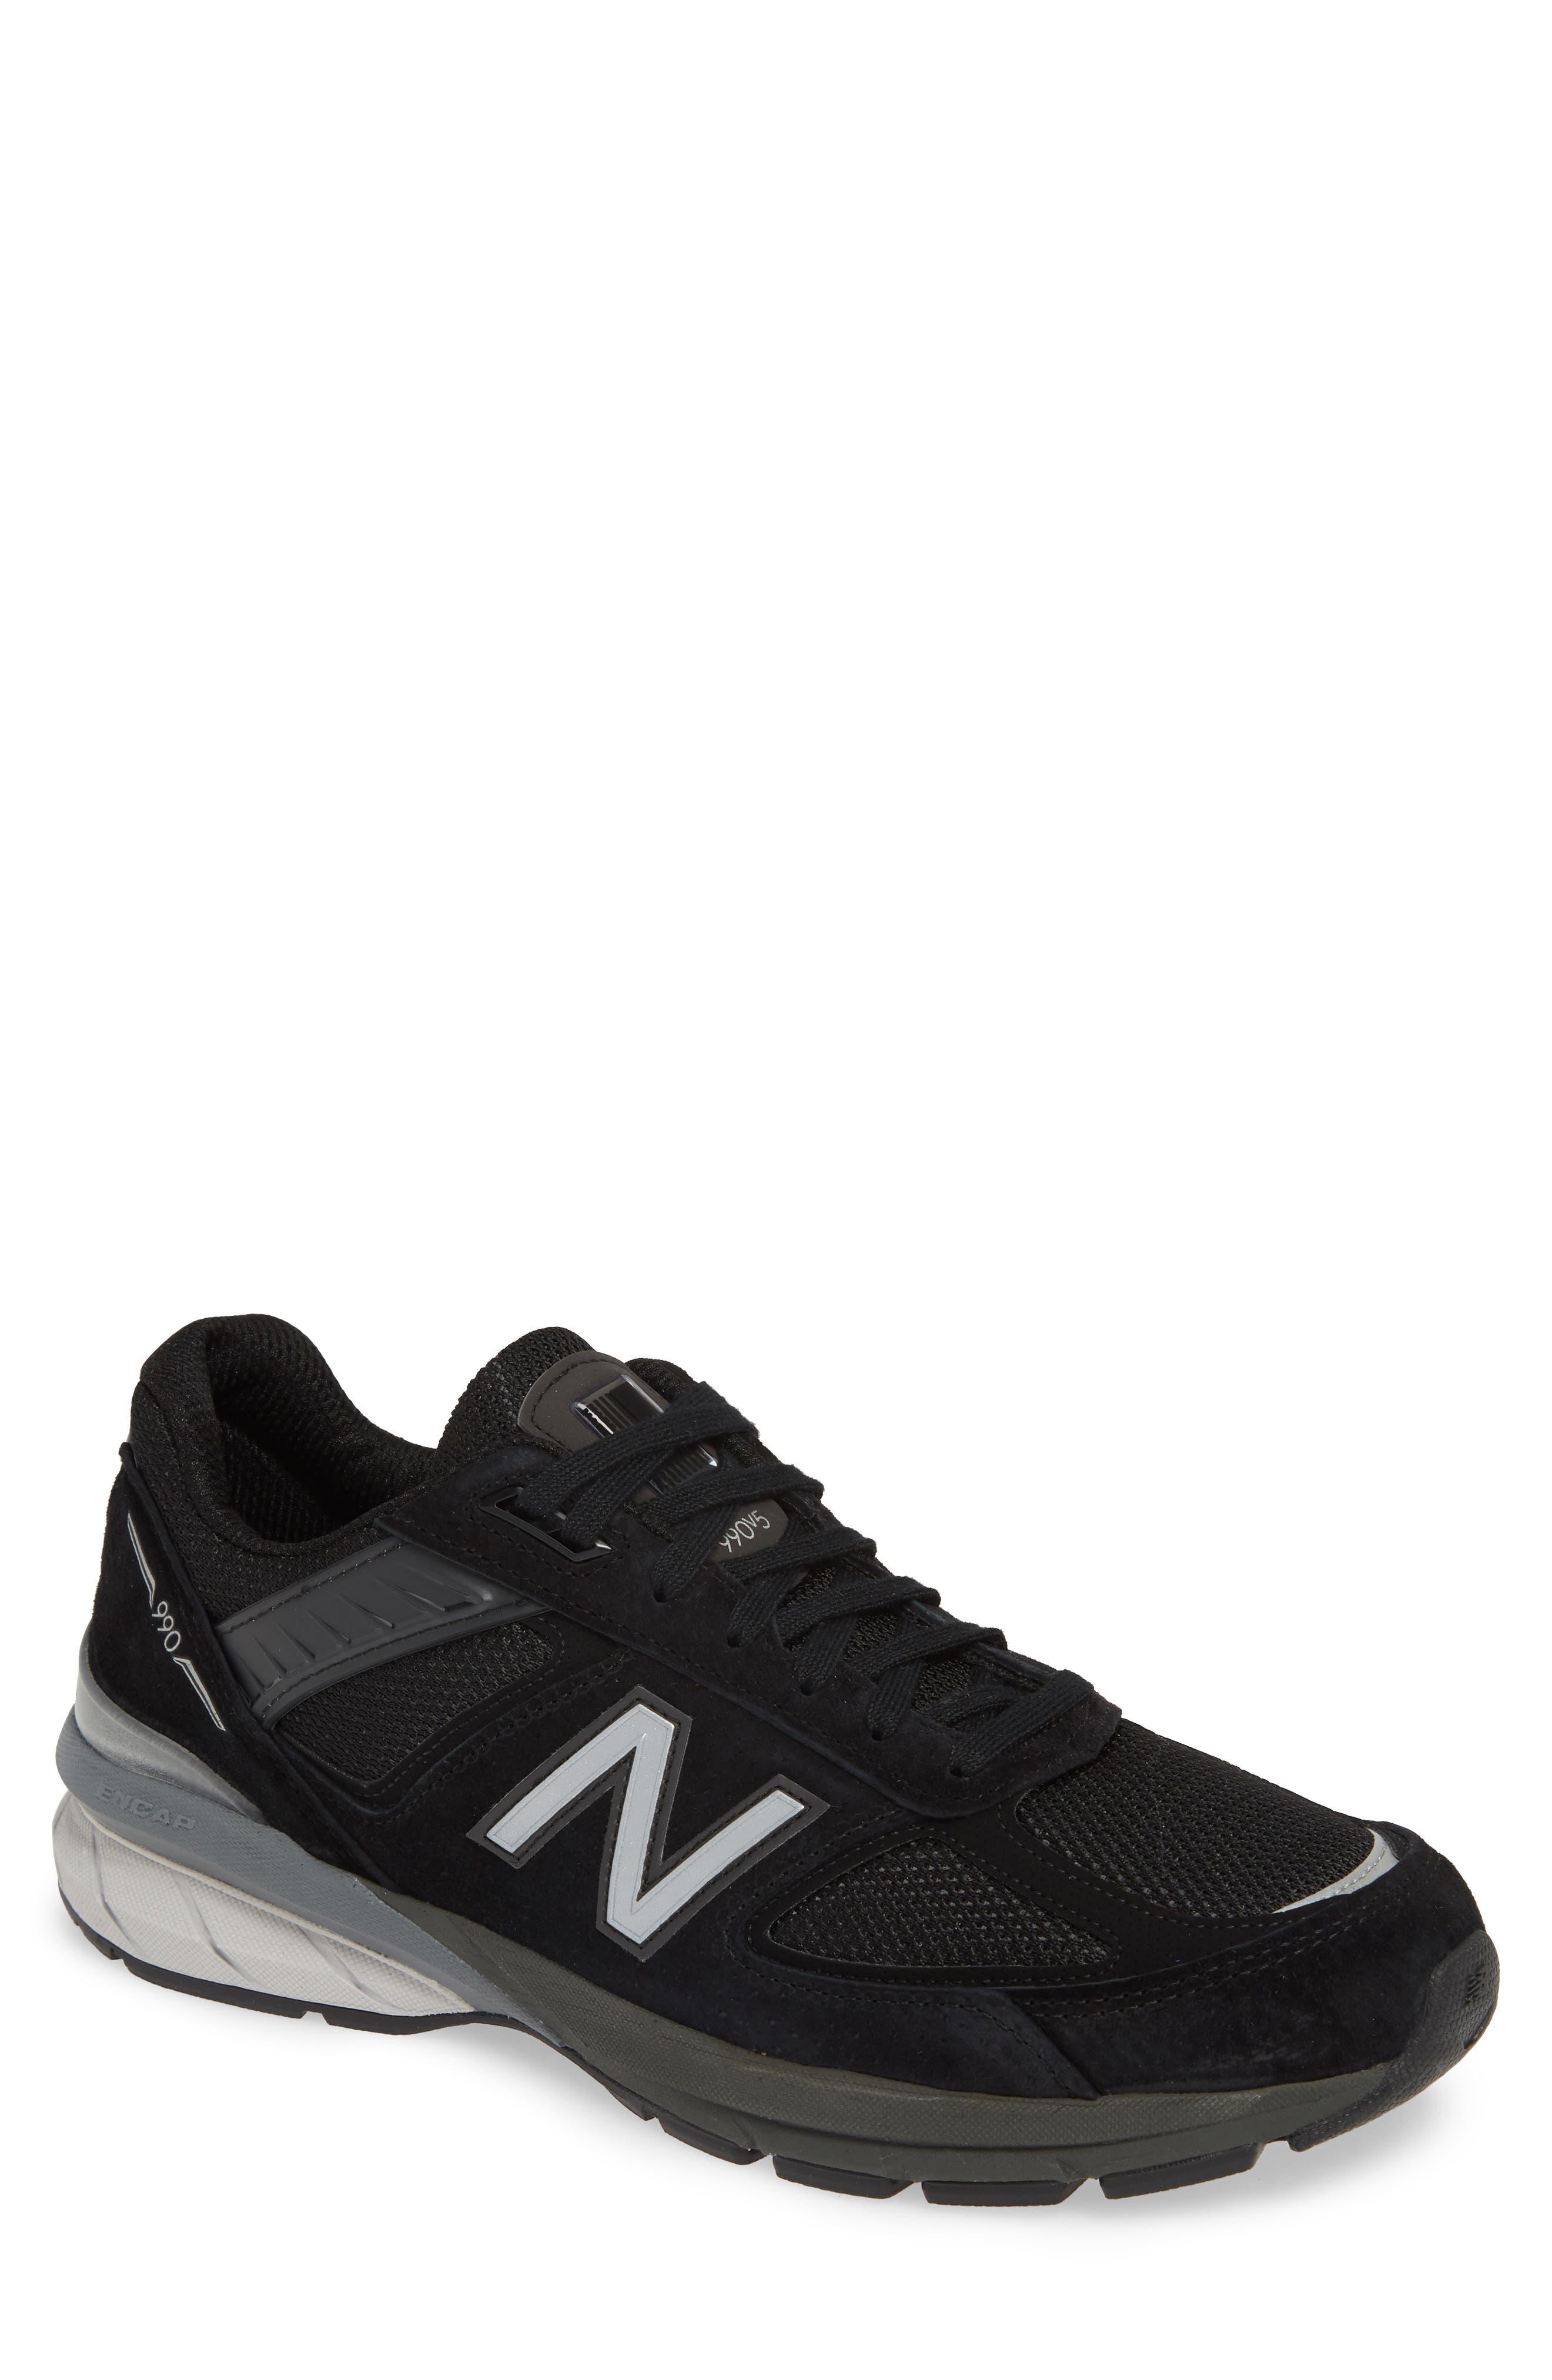 New Balance | Nordstrom